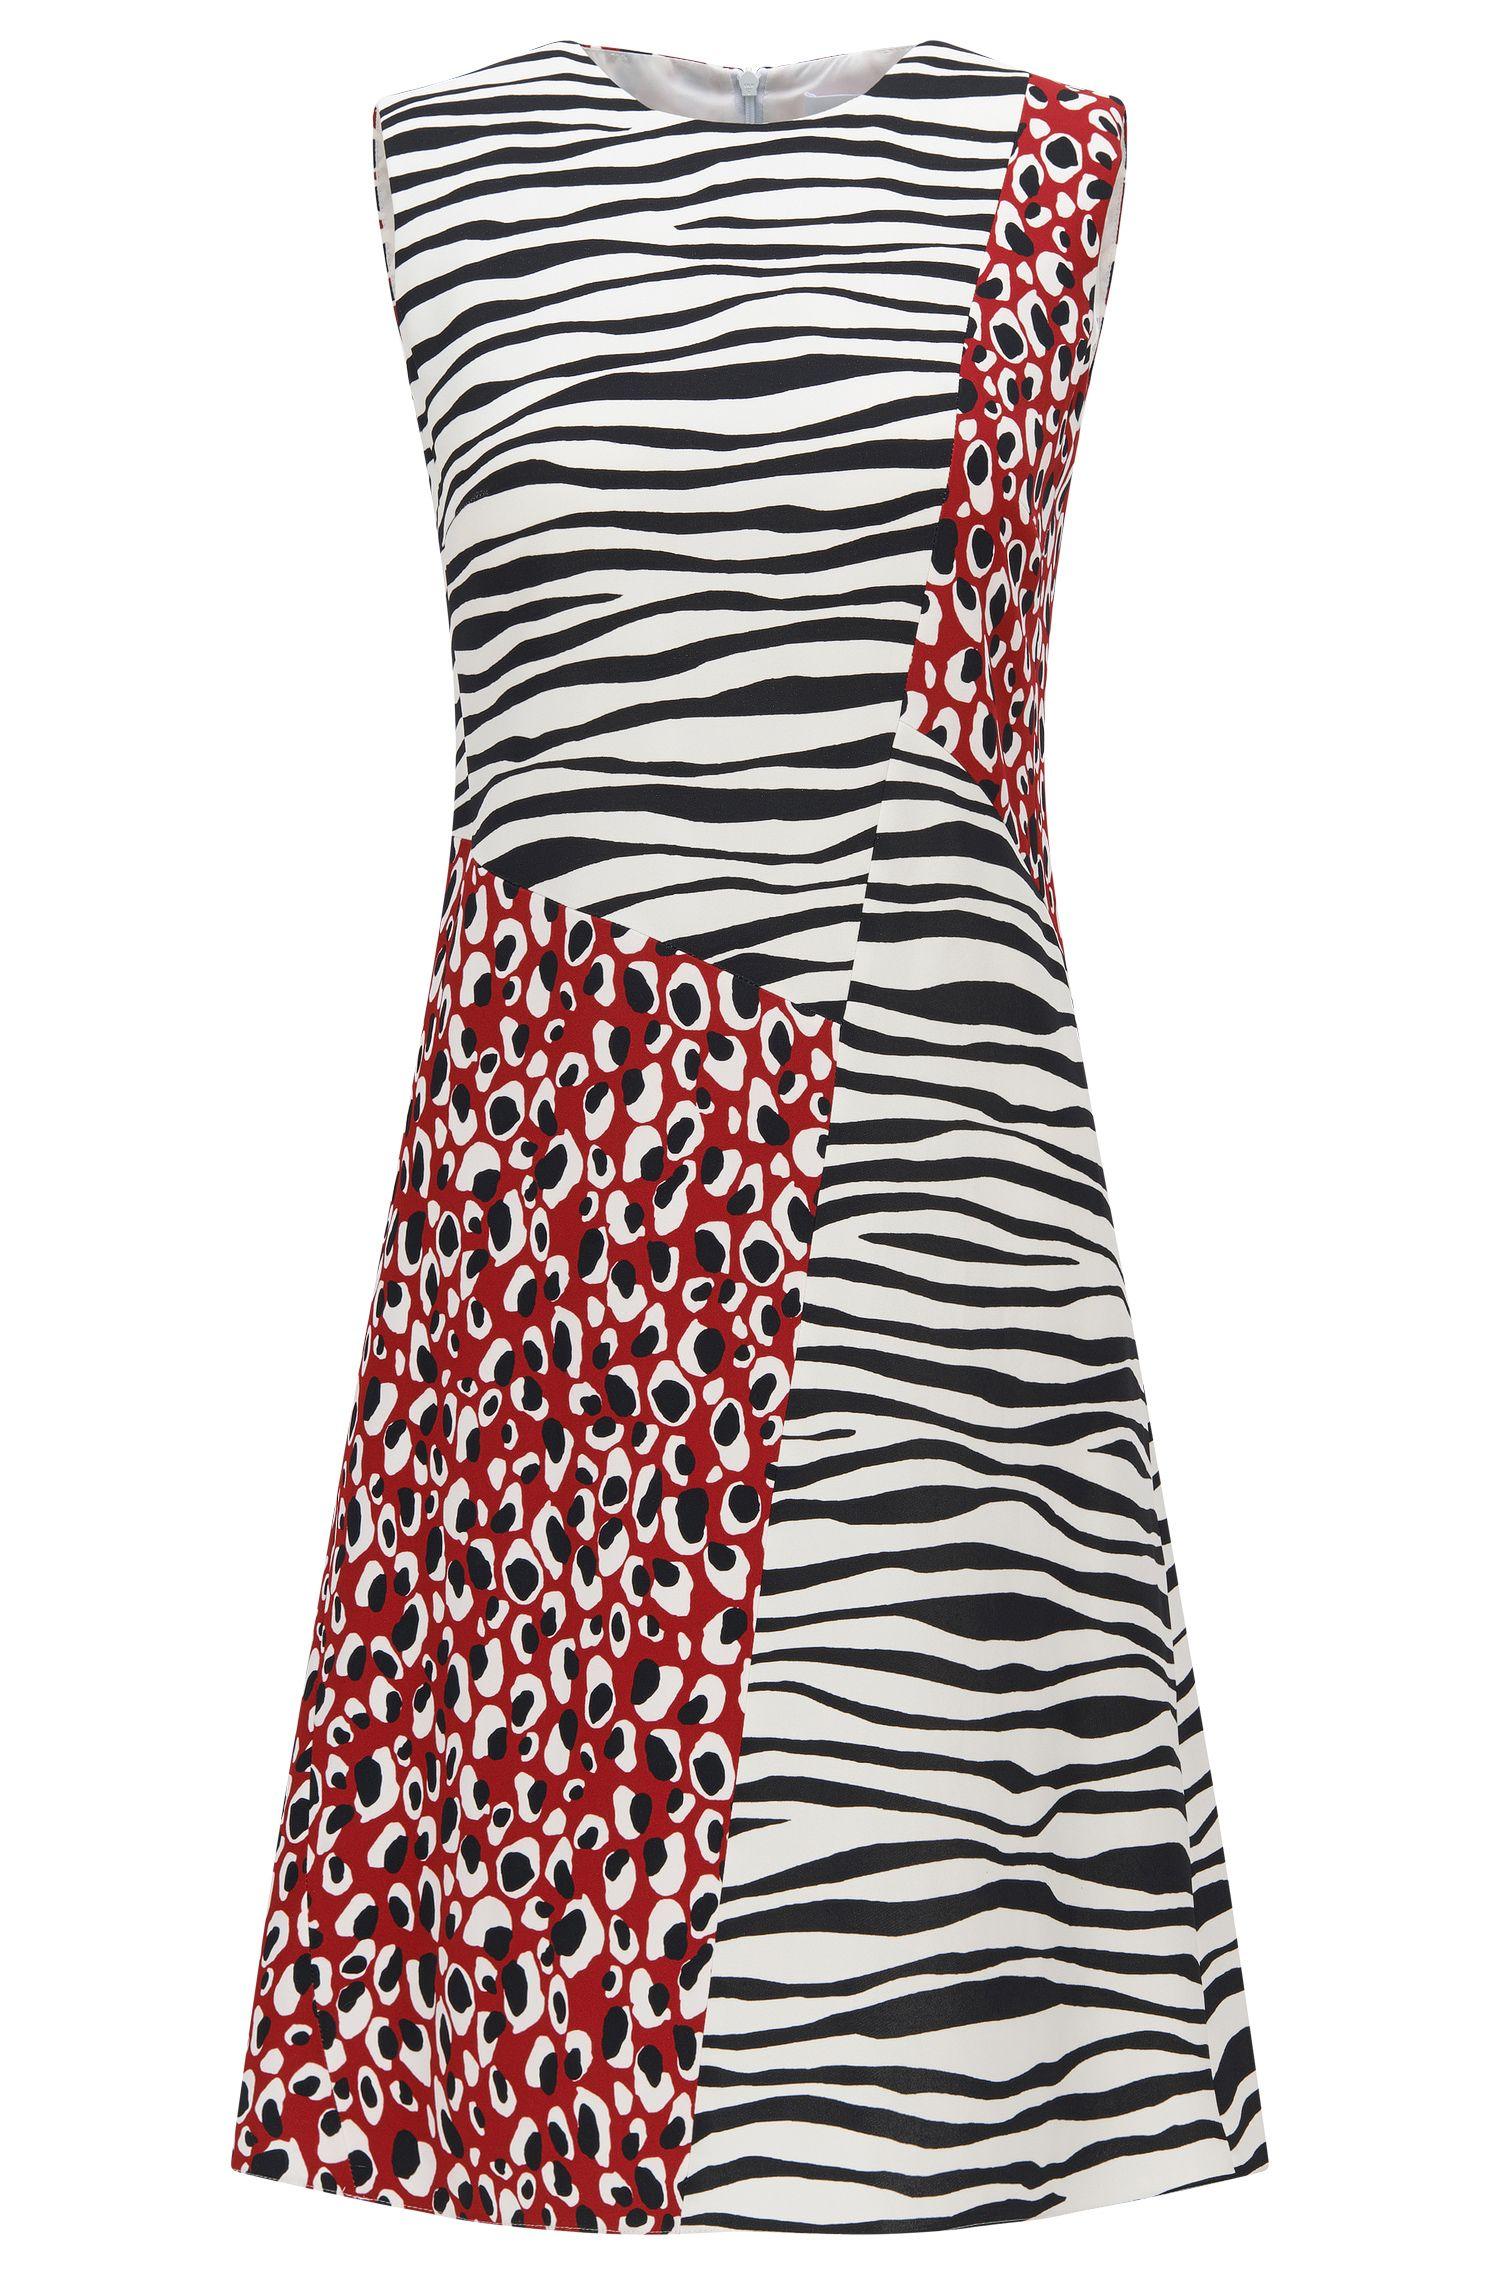 'Diseba' | Animal-Print Stretch Dress